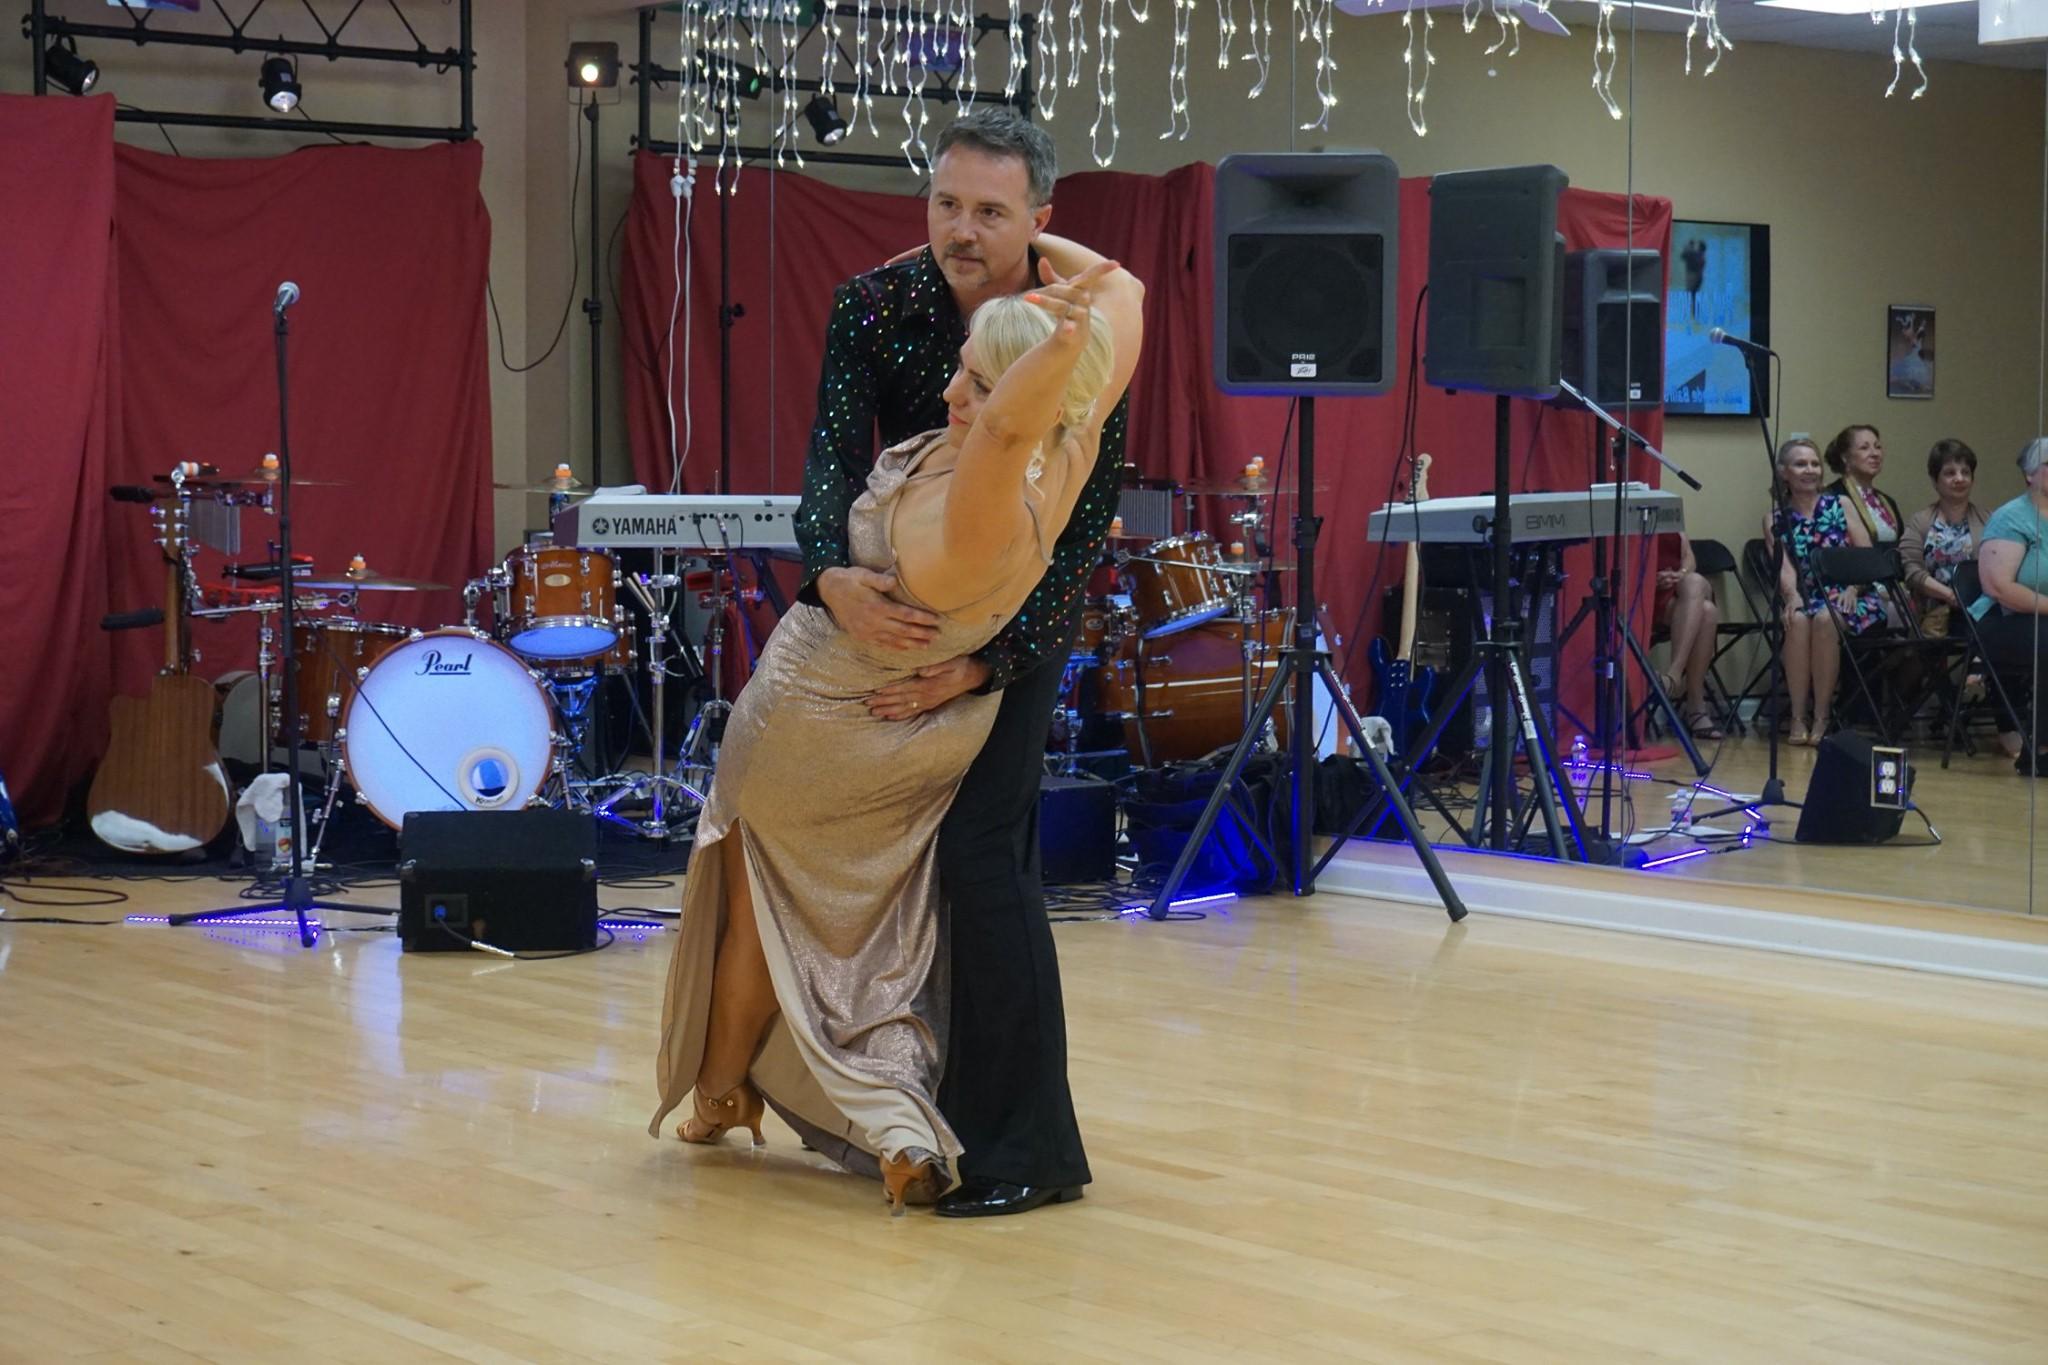 Dance classes - ballroom and Latin